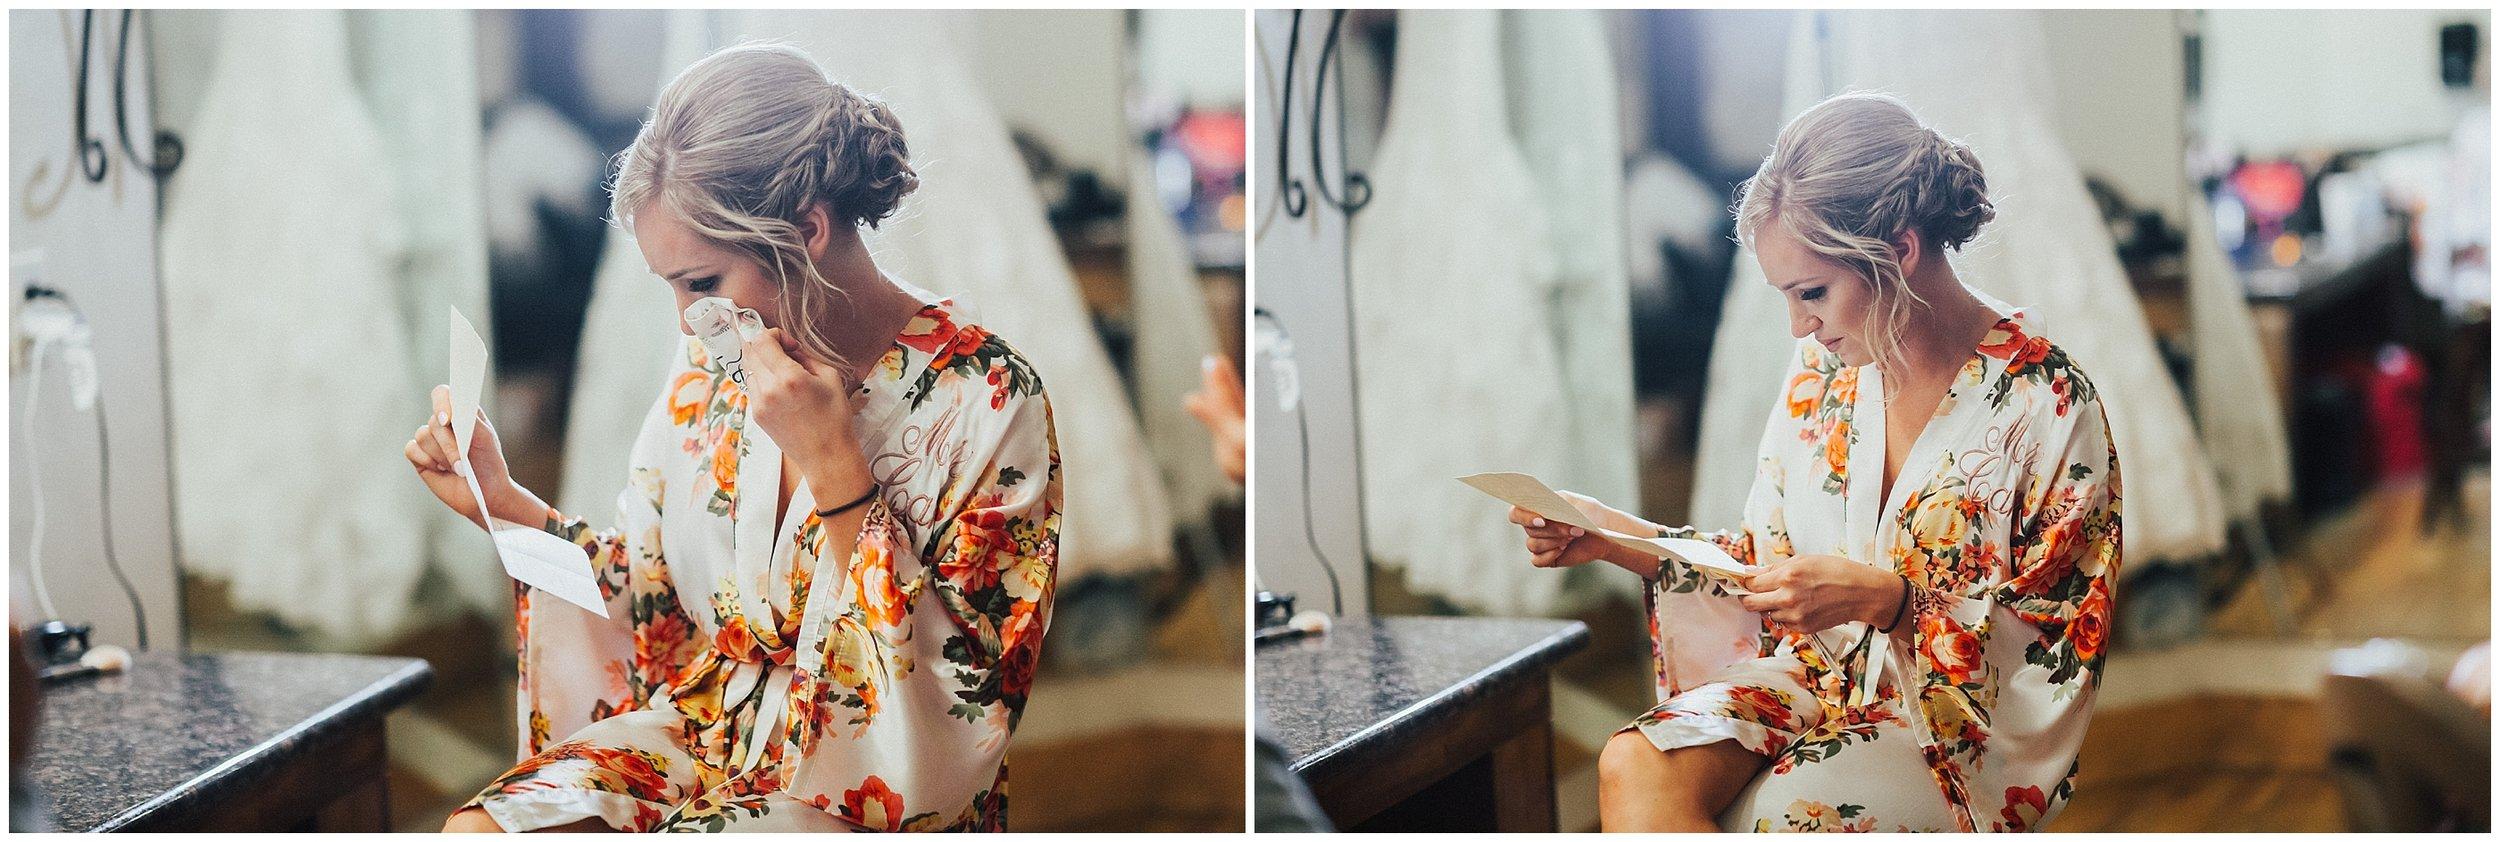 Madeleine Frost - Texas Wedding Photographer-2271.jpg